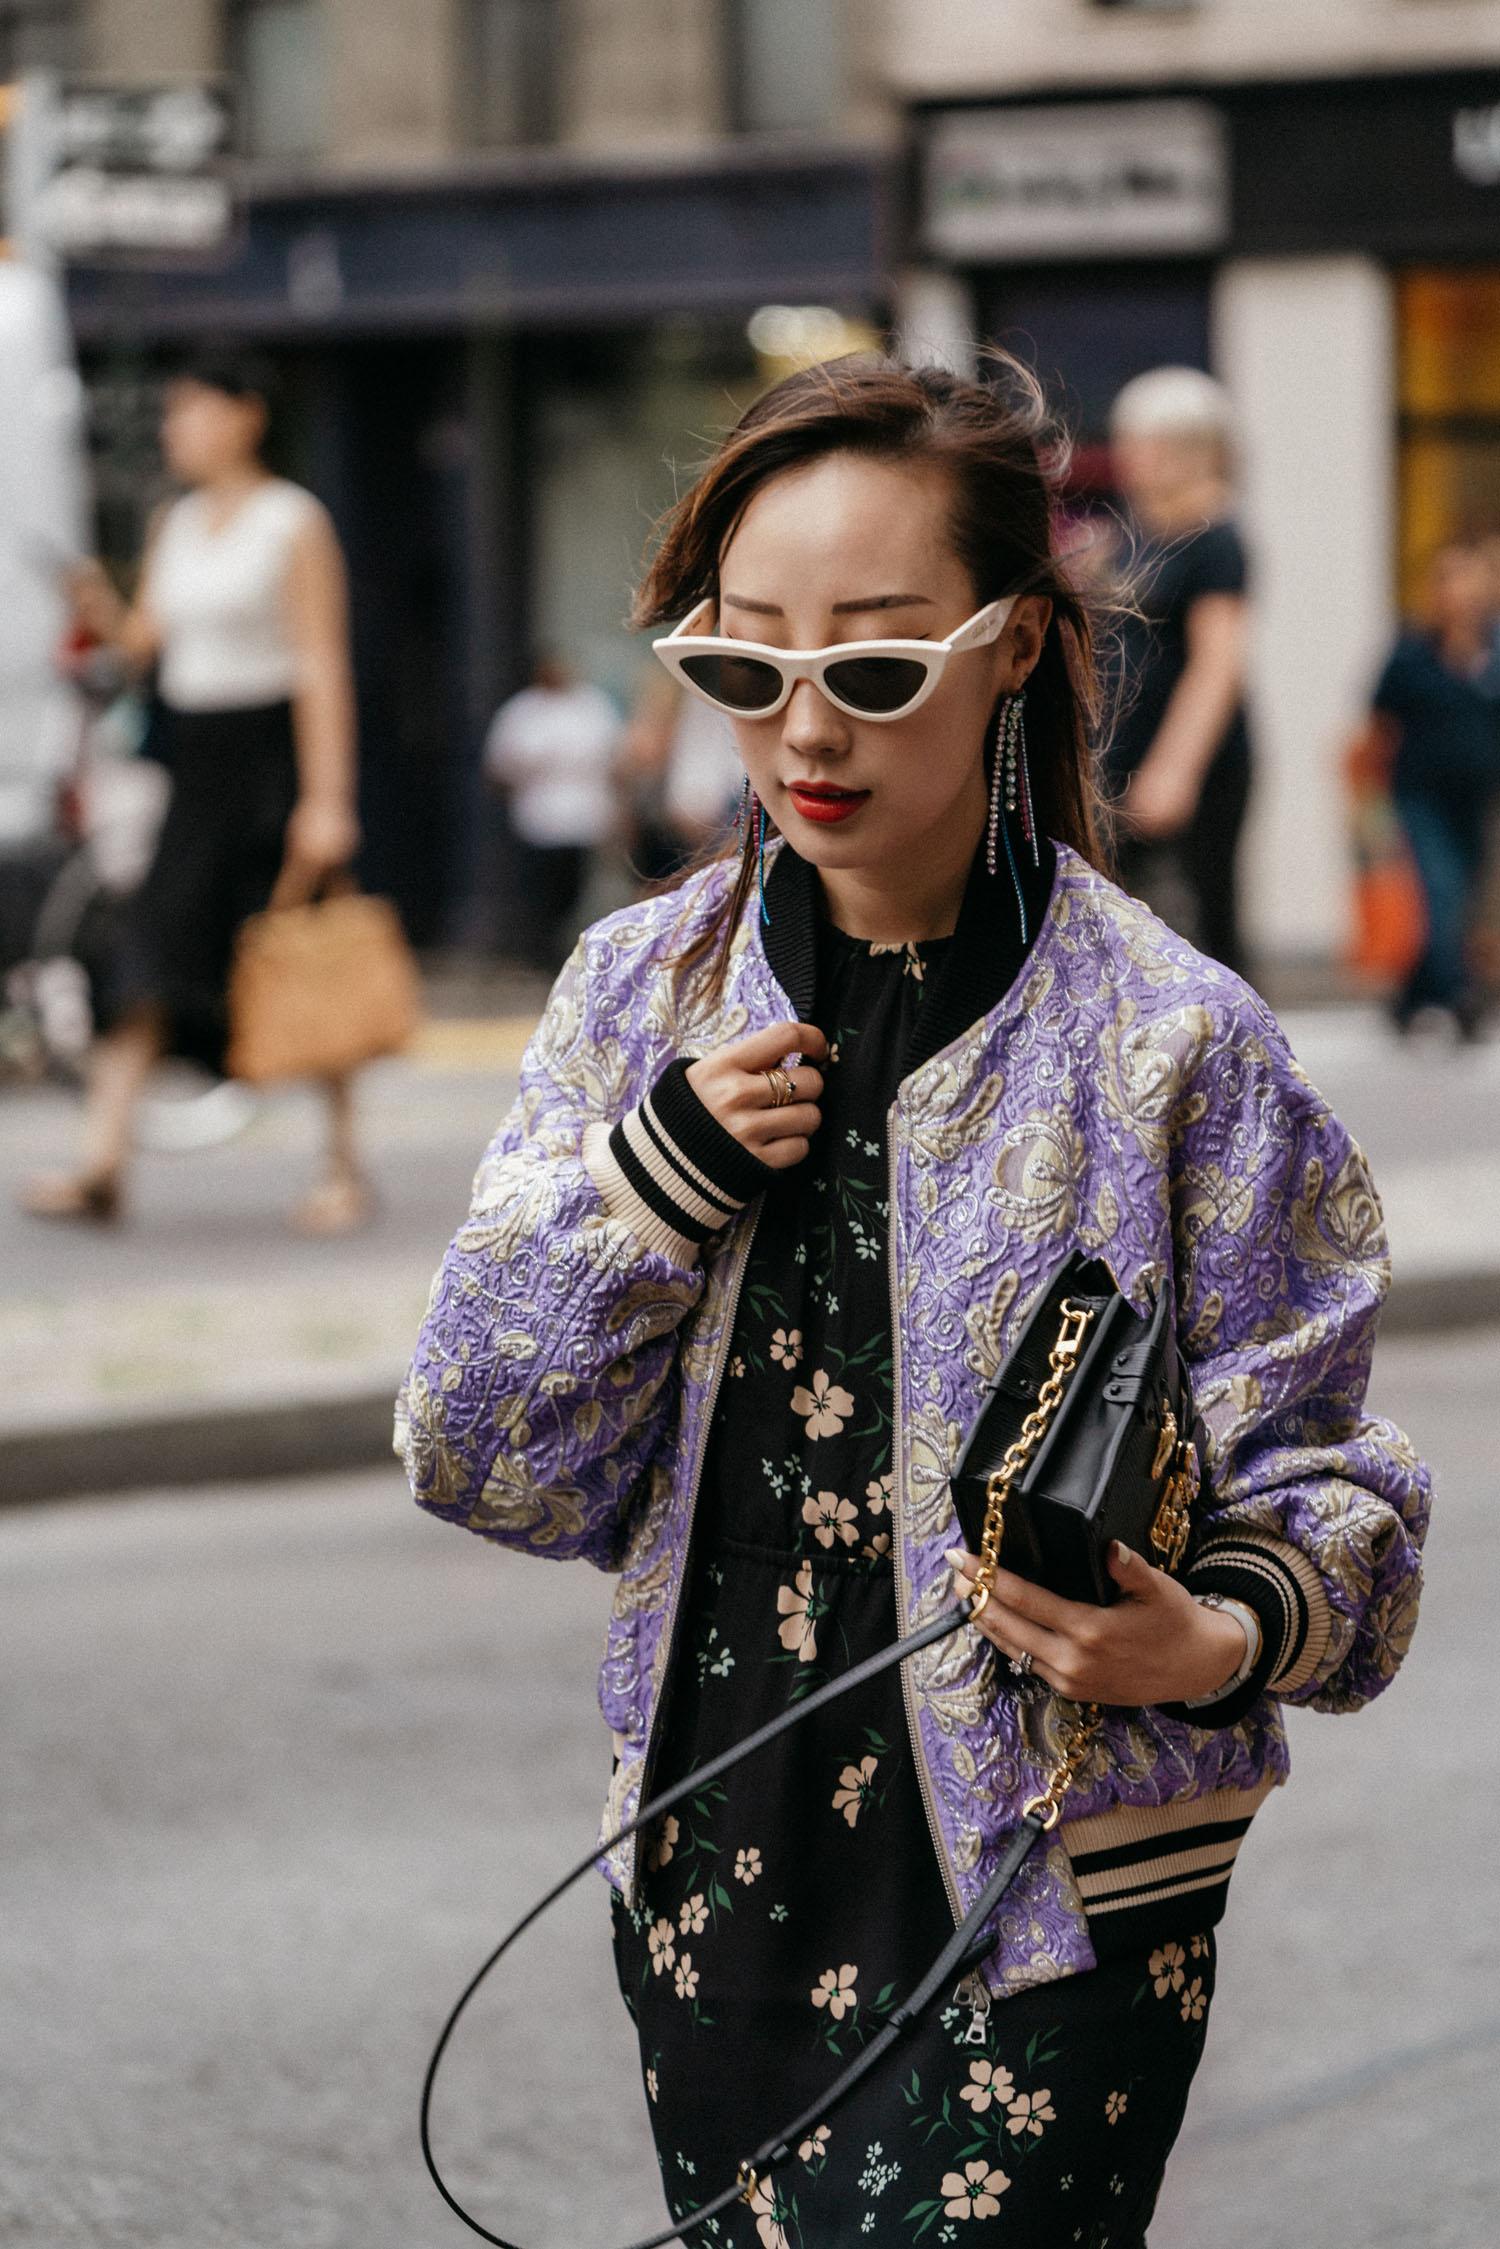 Dries Van Noten Jacket, Aritzia Dress,  Stuart Weitzman Boots ,  Louis Vuitton Bag ,  Céline Sunglasses ,  AREA Earrings